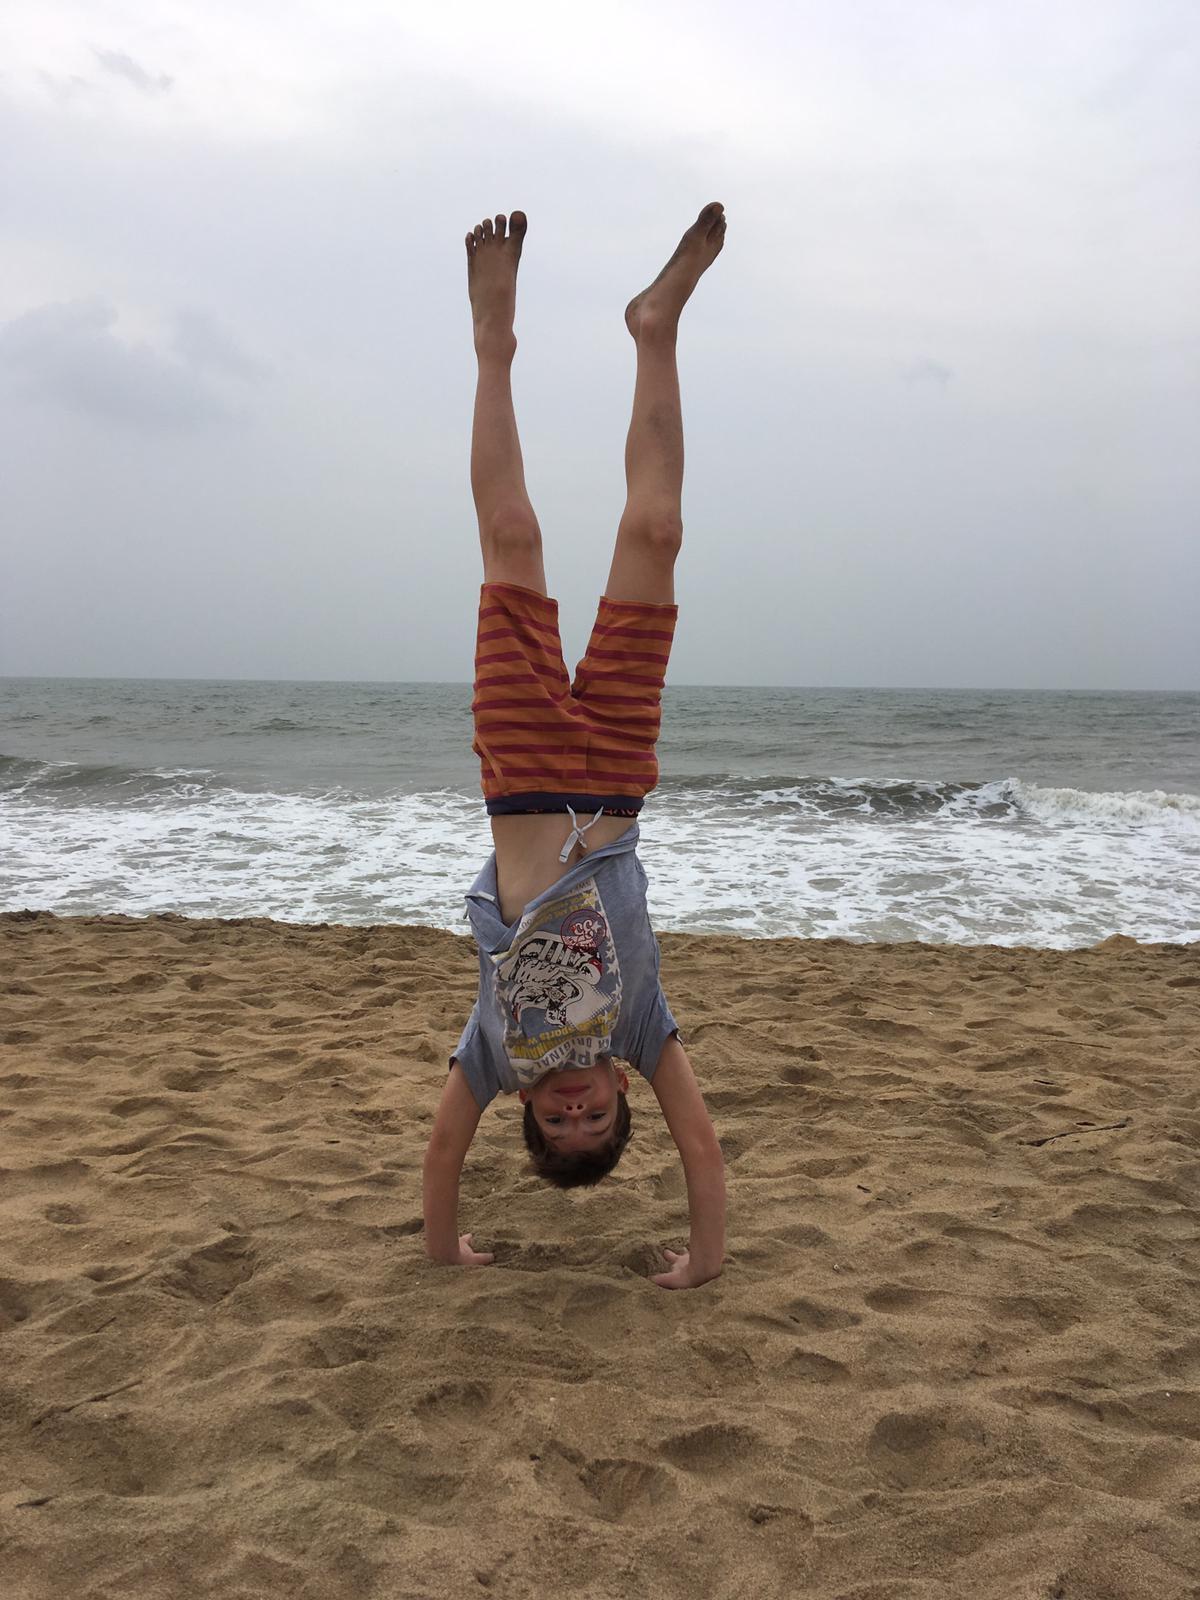 invite-to-paradise-sri-lanka-family-holiday-specialists-customer-feedback-pickering-beach-handstand.jpg